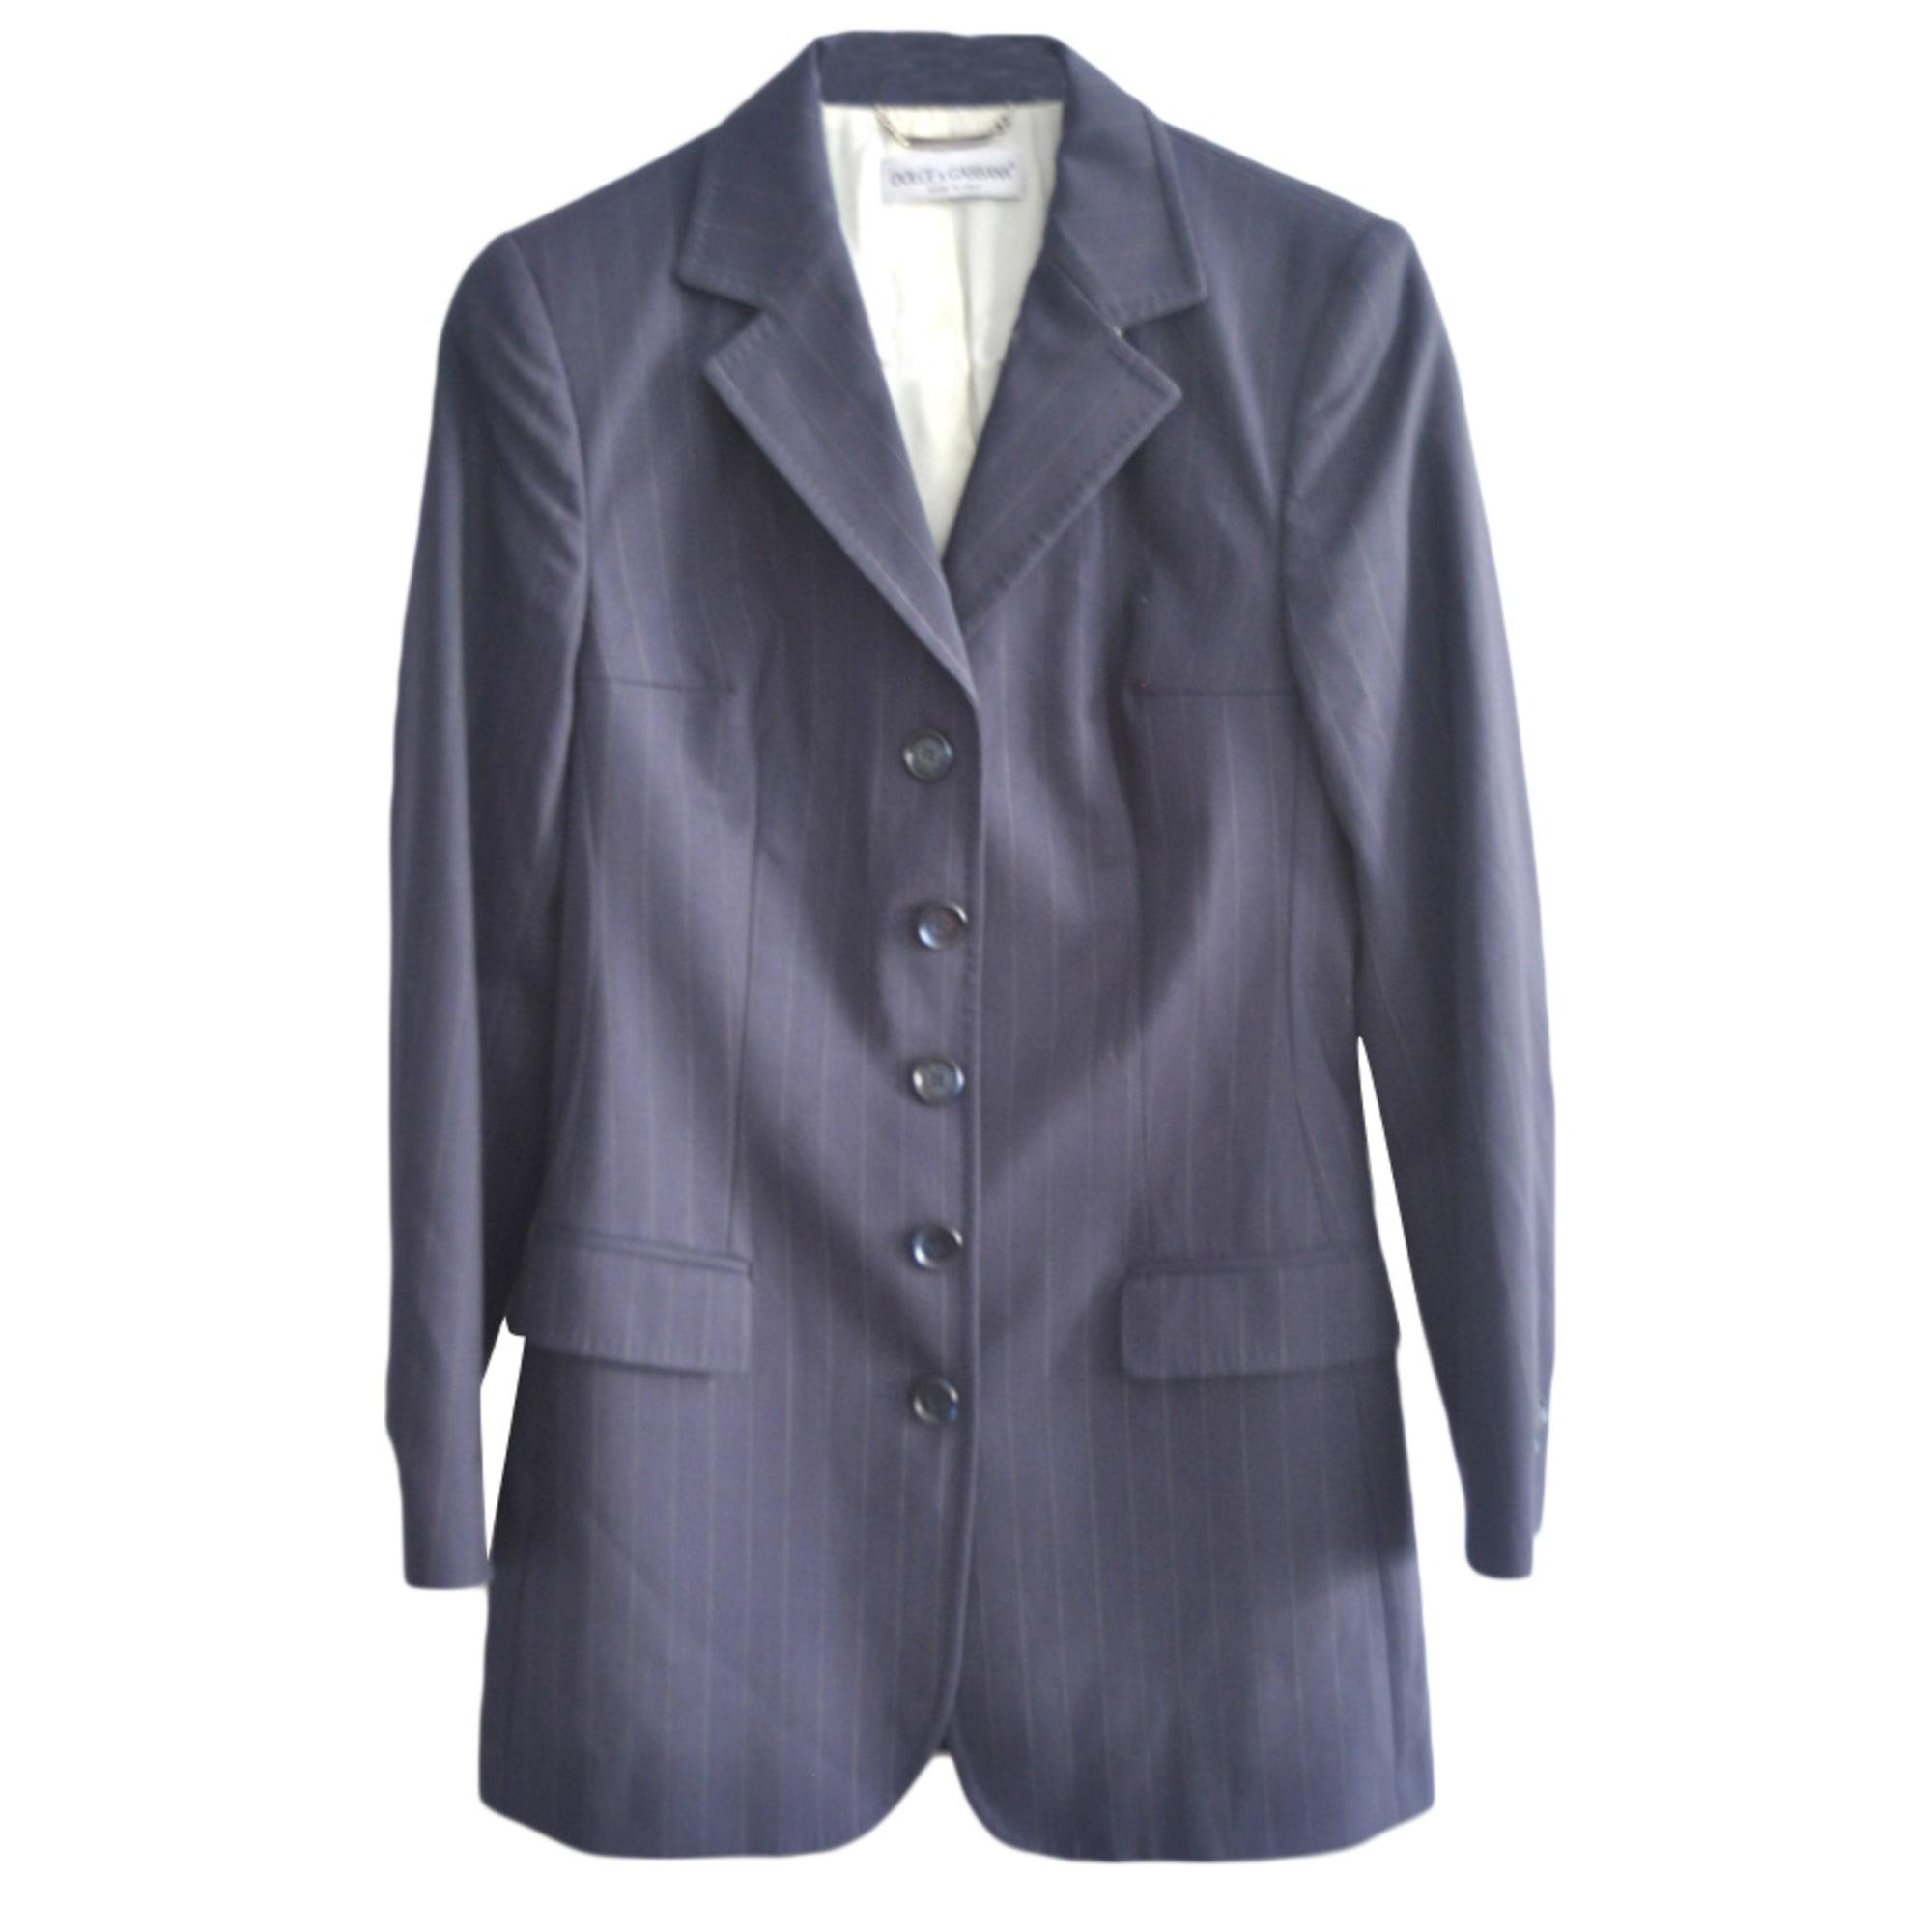 Blazer DOLCE & GABBANA Blue, navy, turquoise